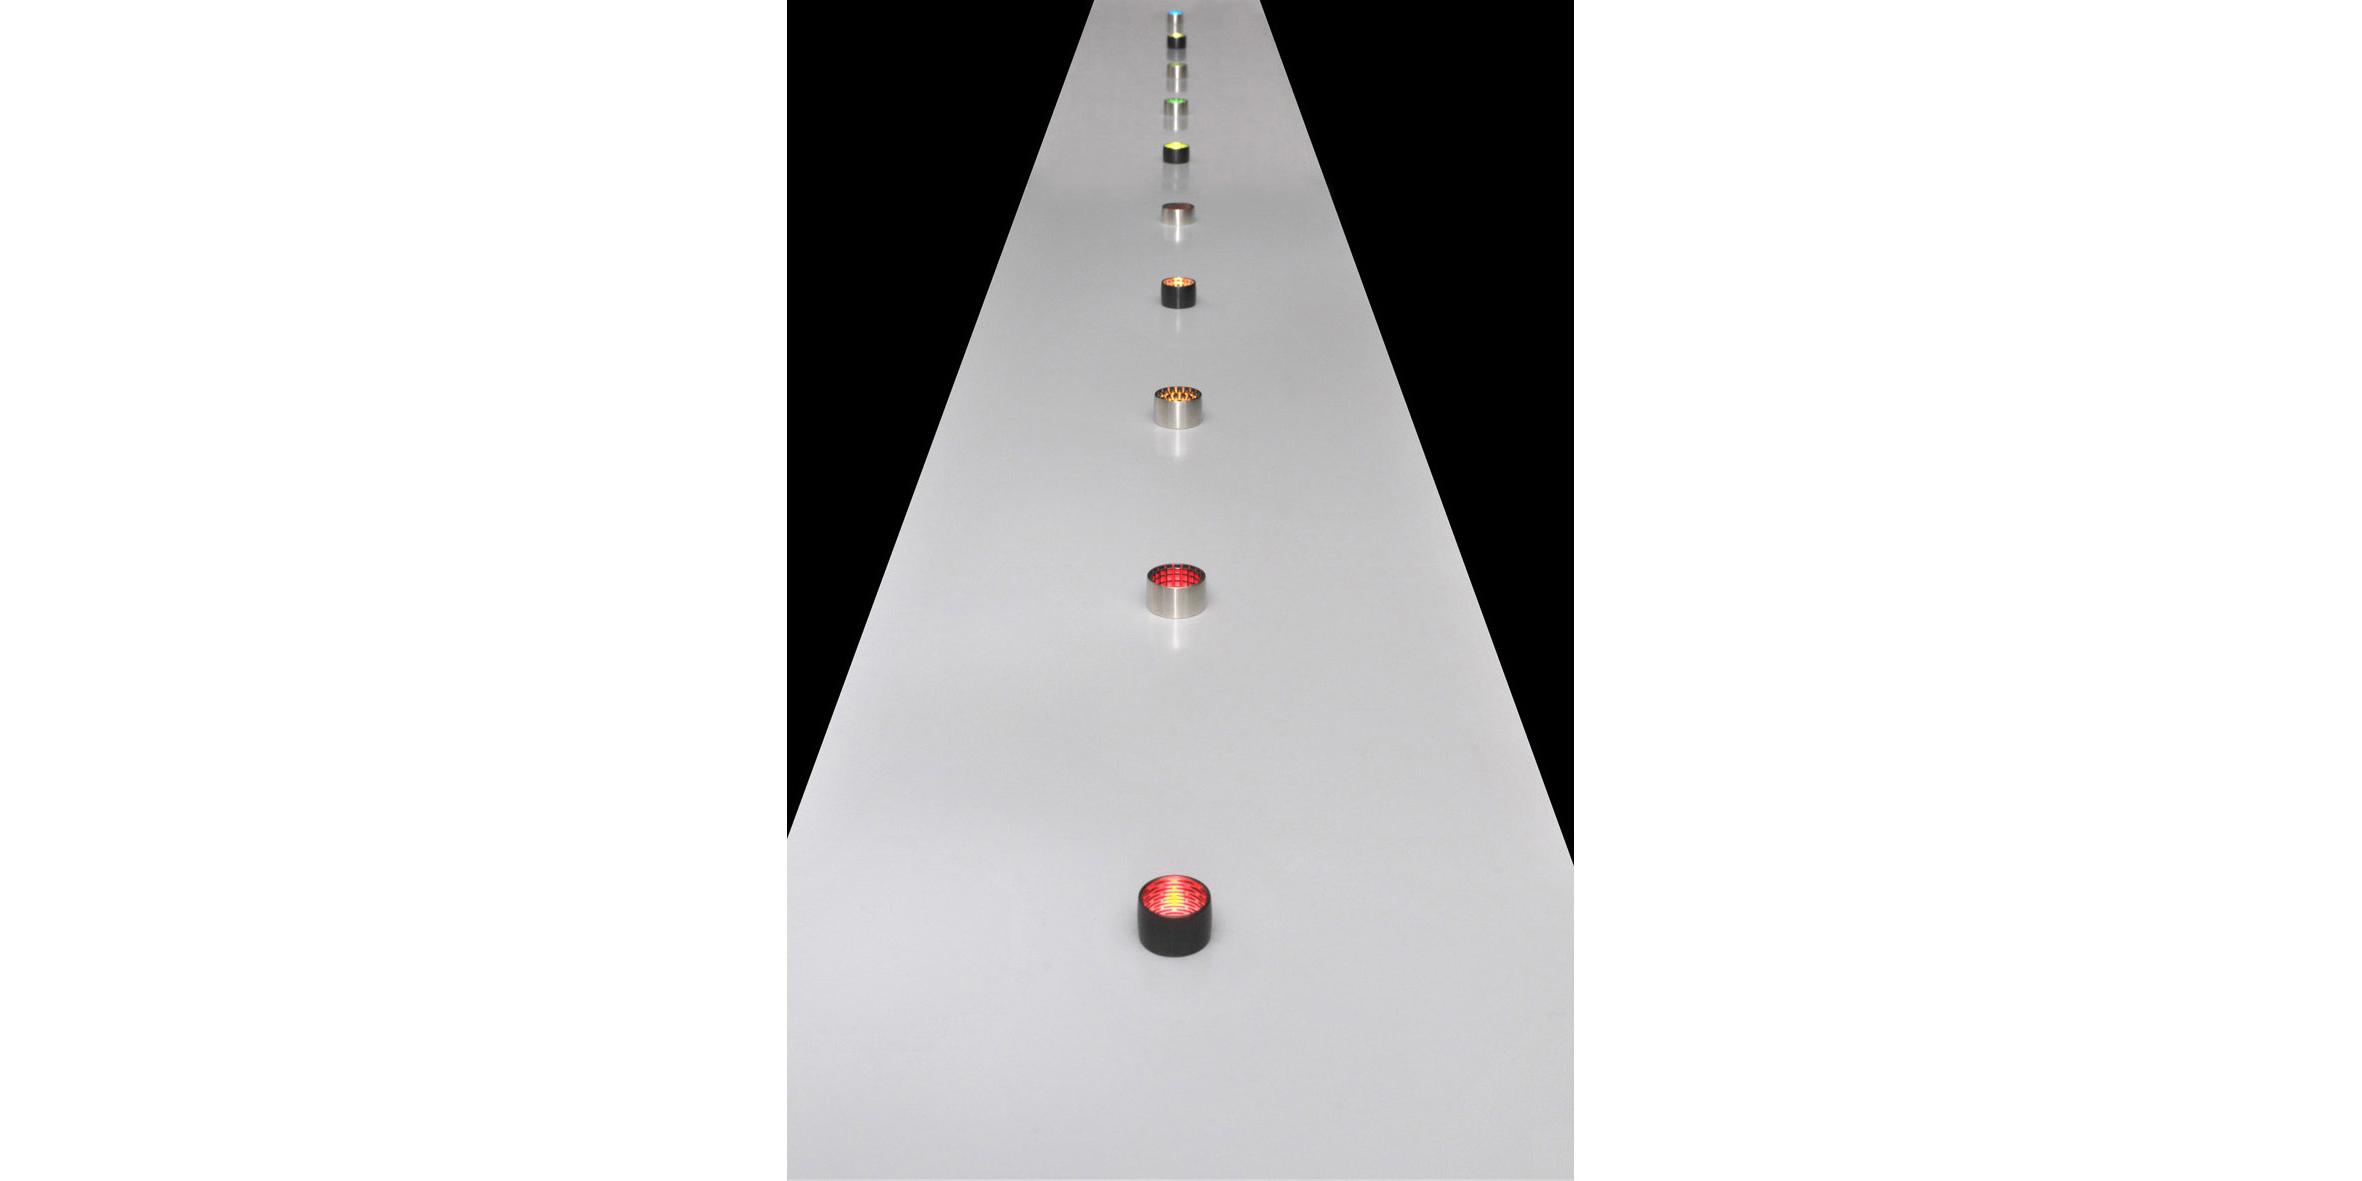 Covert Jewels installation, 2011